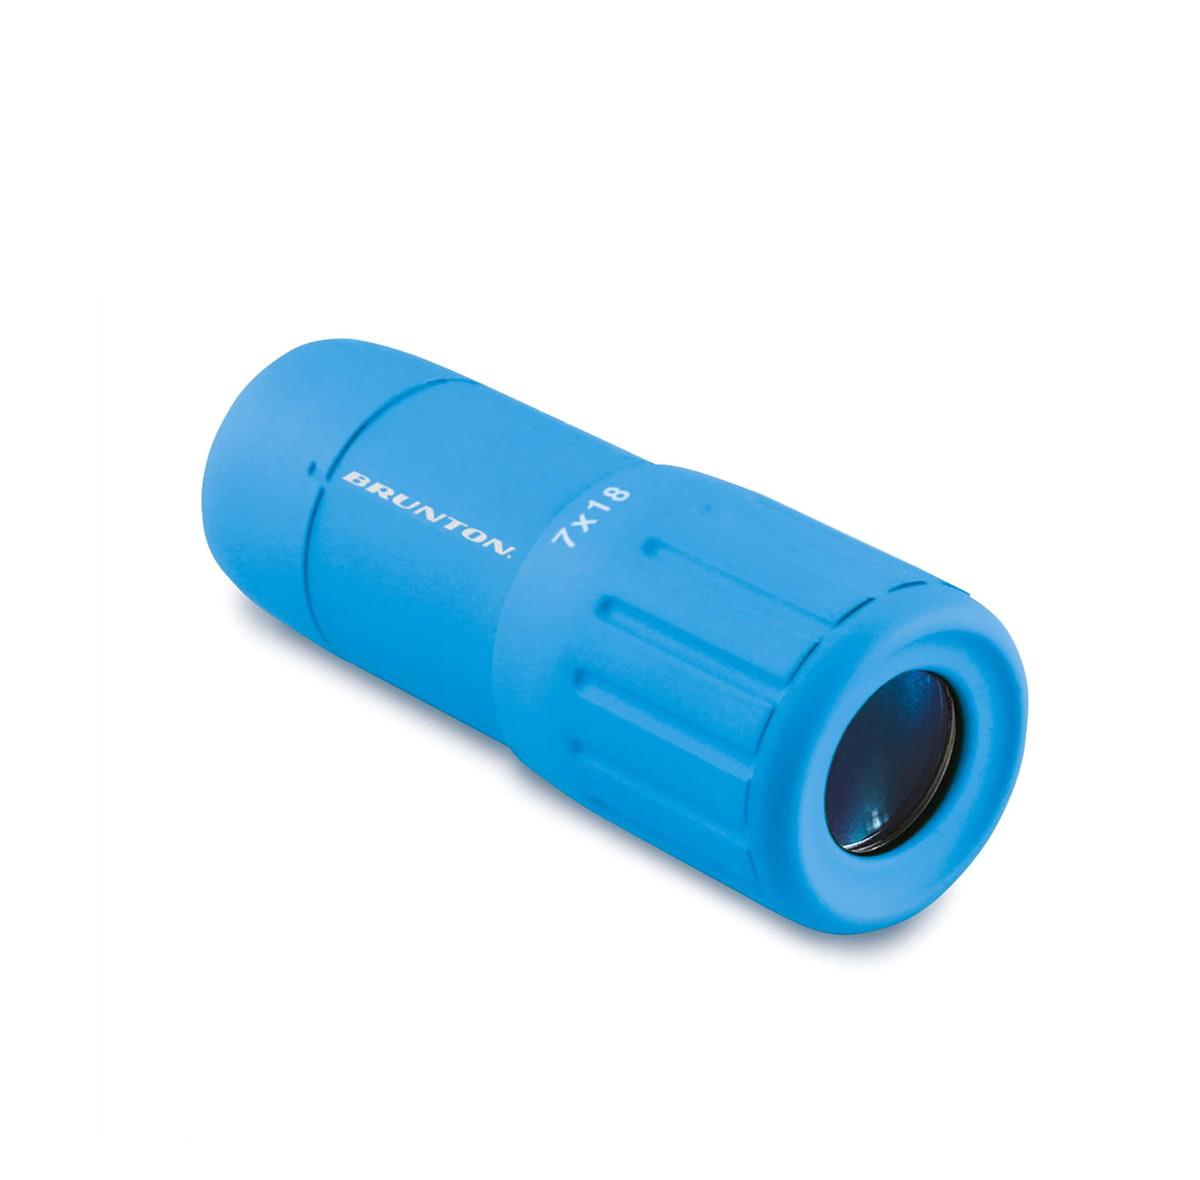 Pocket-friendly telescope